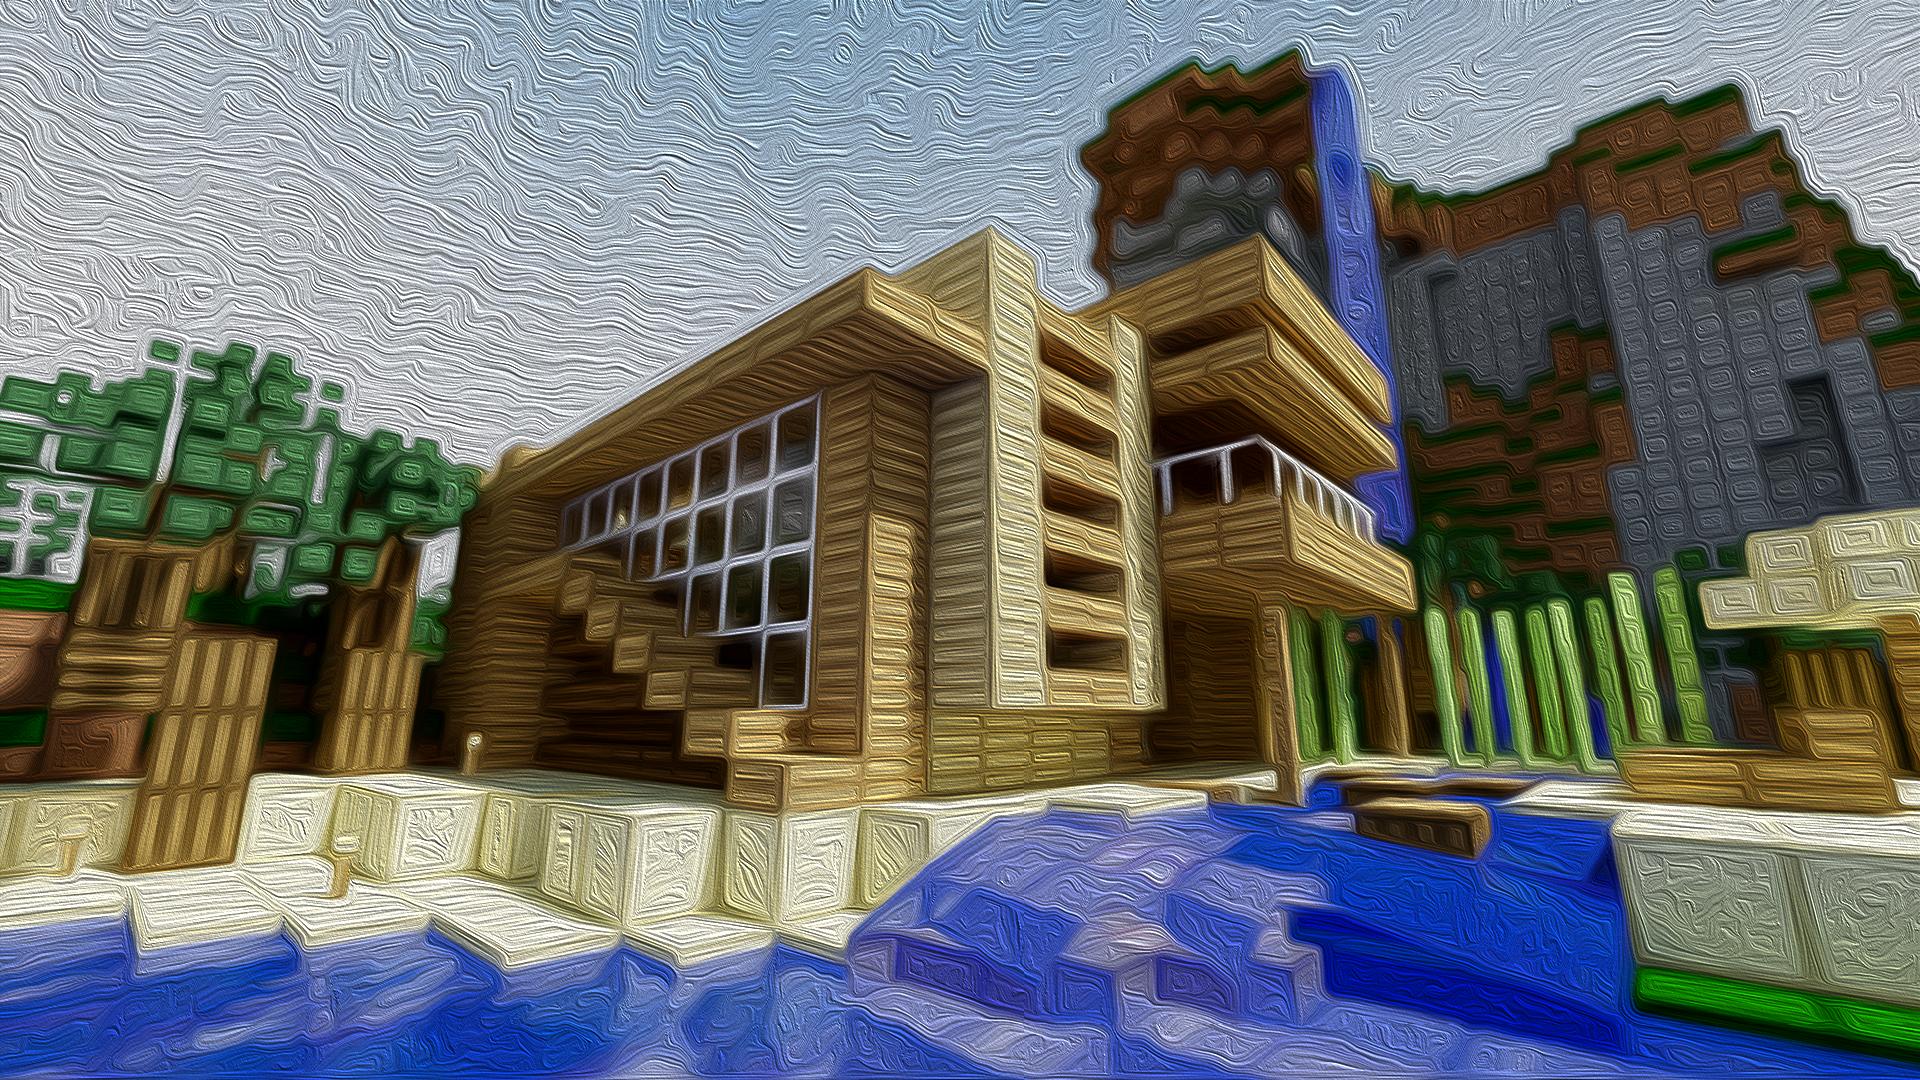 Modern house by Djolanderr on DeviantArt